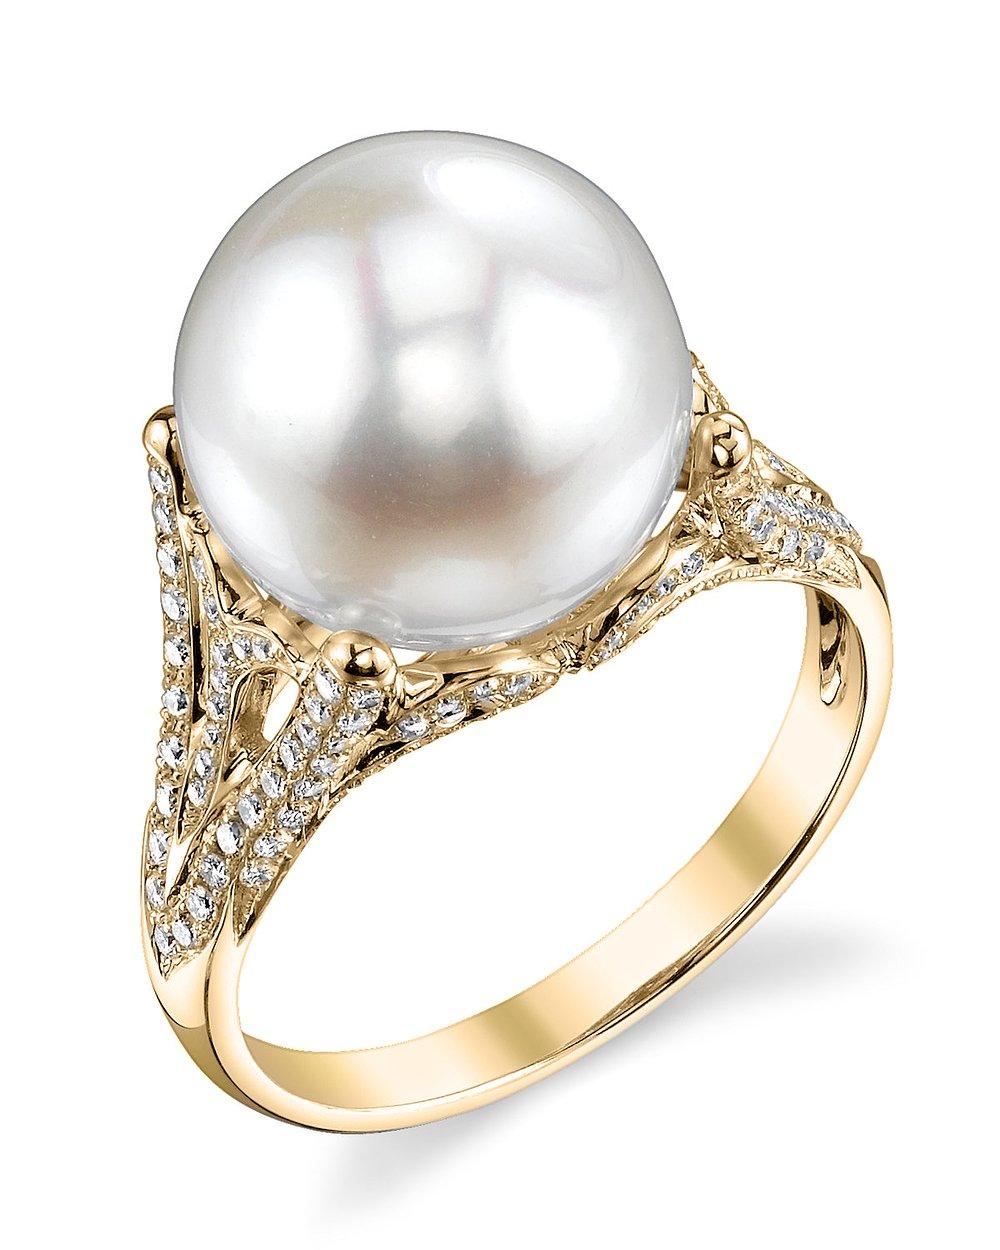 buy white south sea pearl diamond gabriella ring for. Black Bedroom Furniture Sets. Home Design Ideas